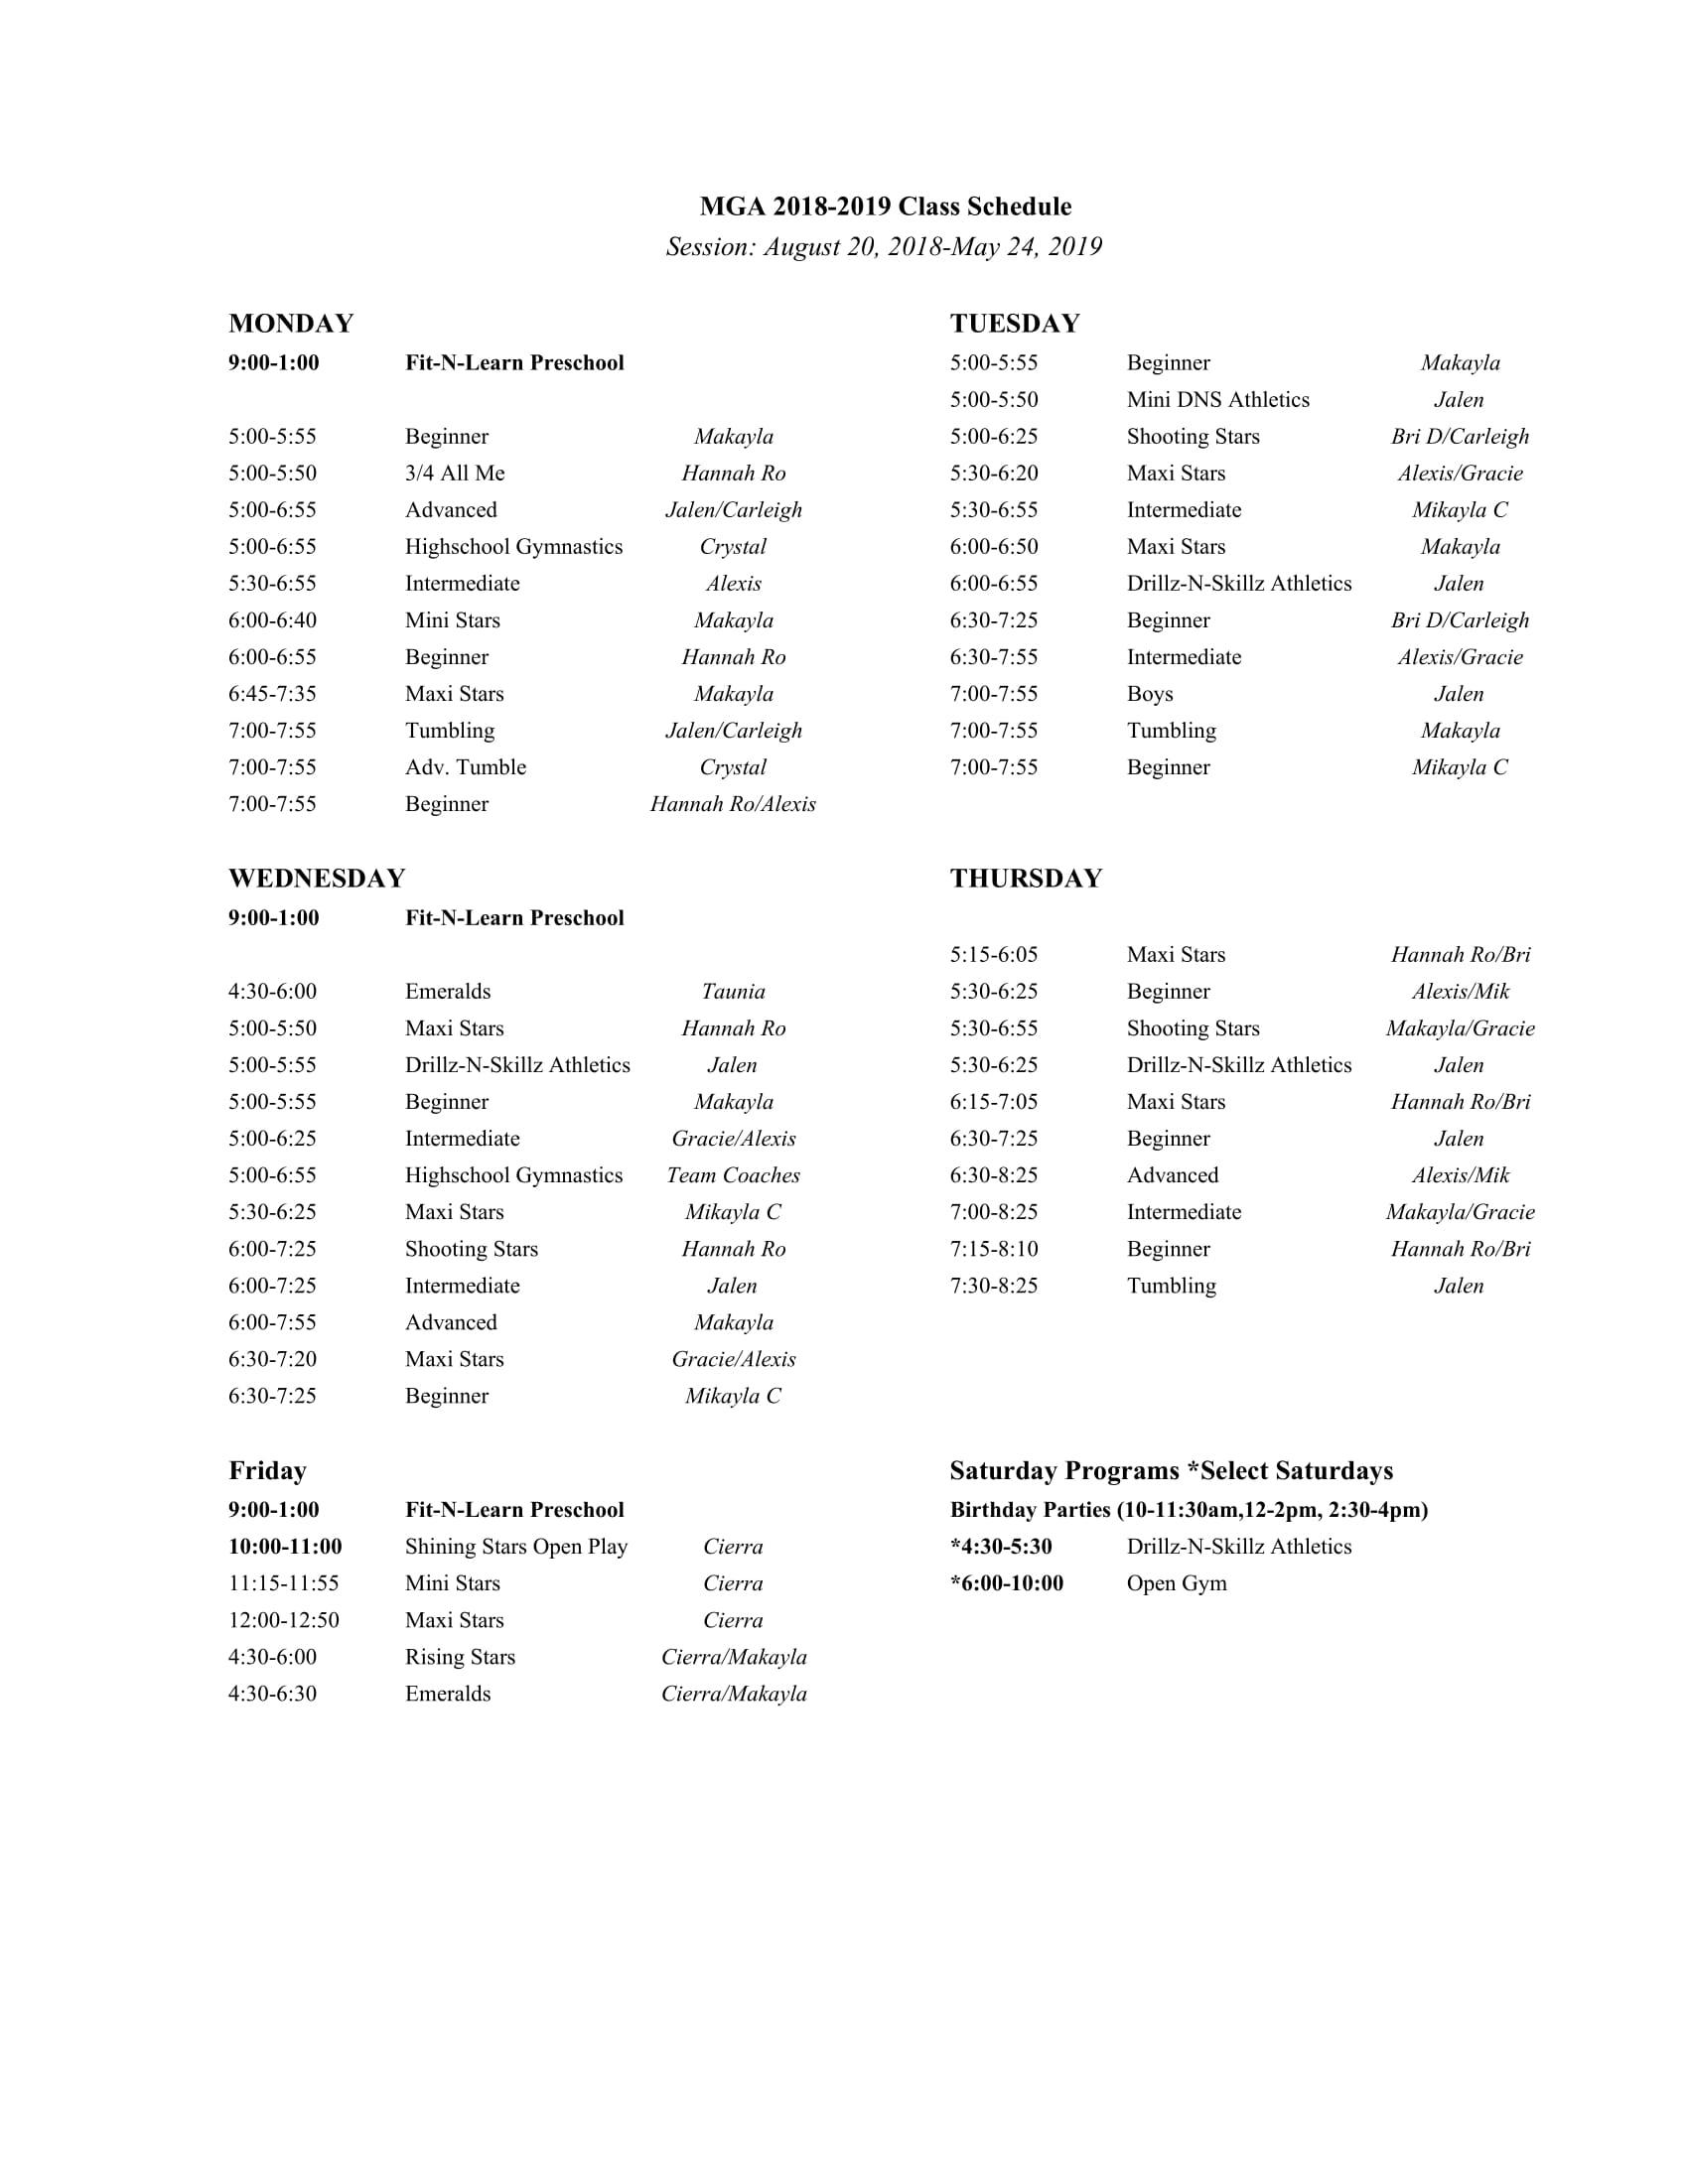 mga class schedule fall 2018-19